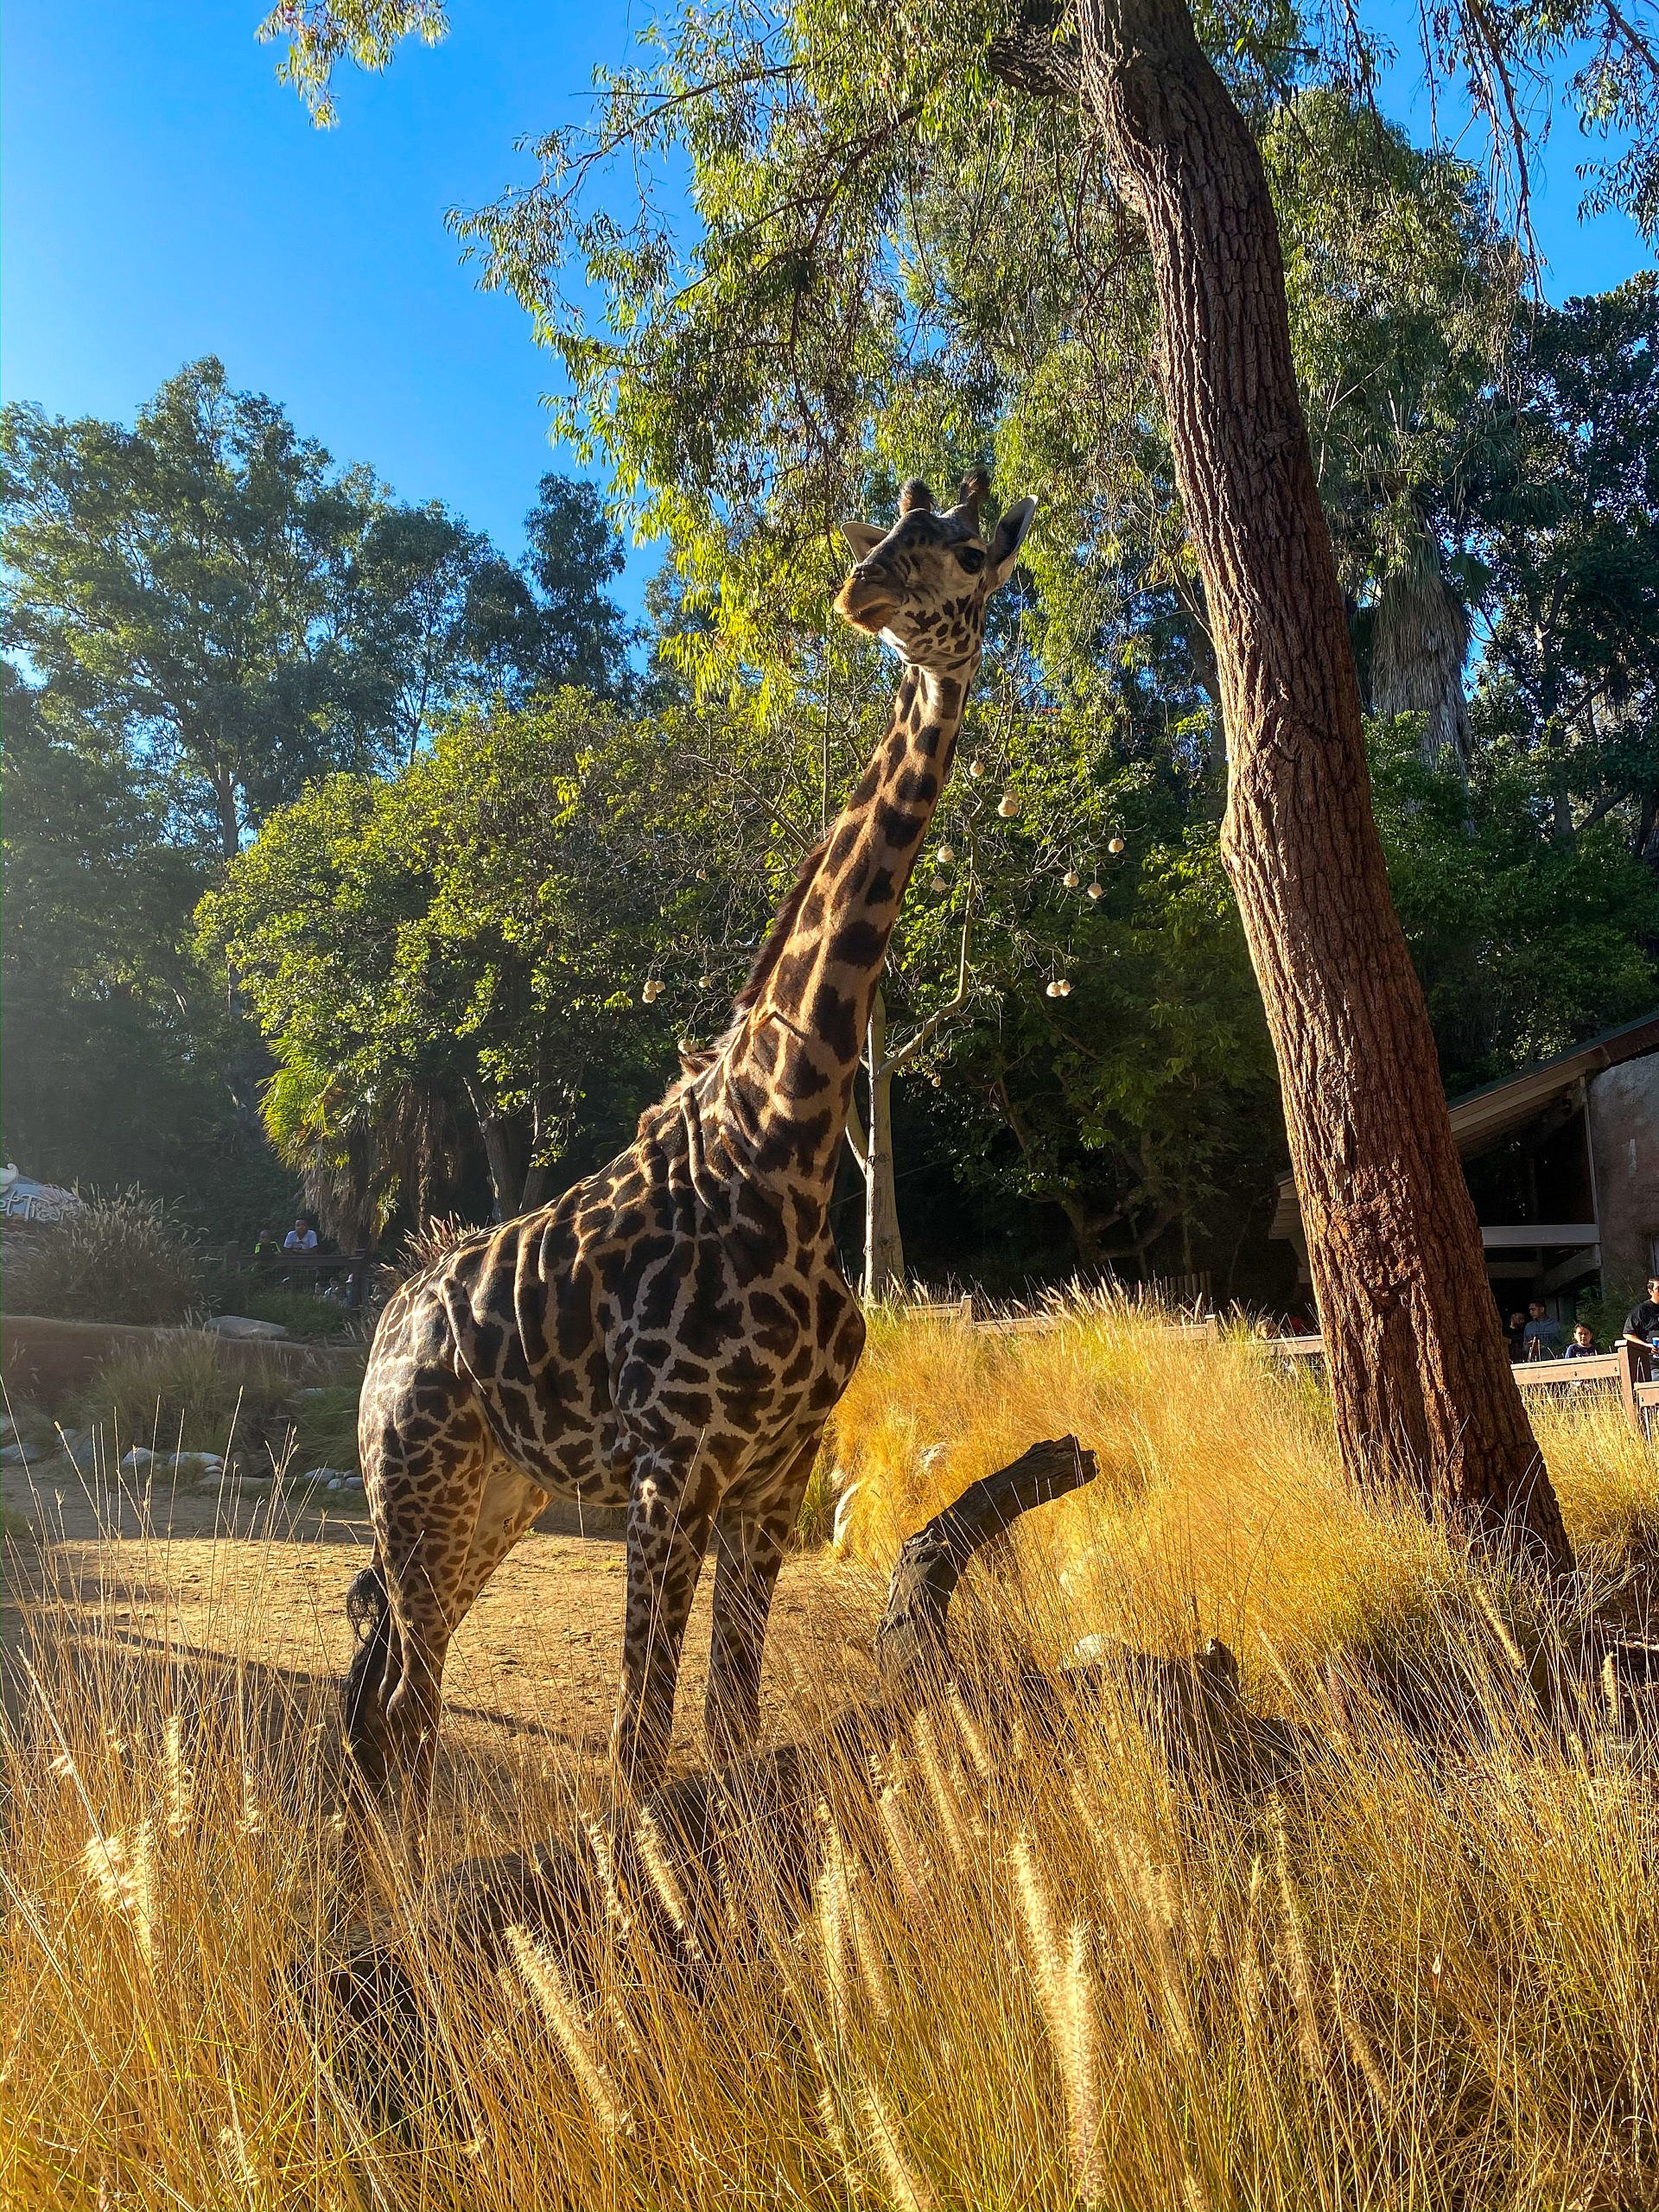 Giraffe at the Los Angeles Zoo